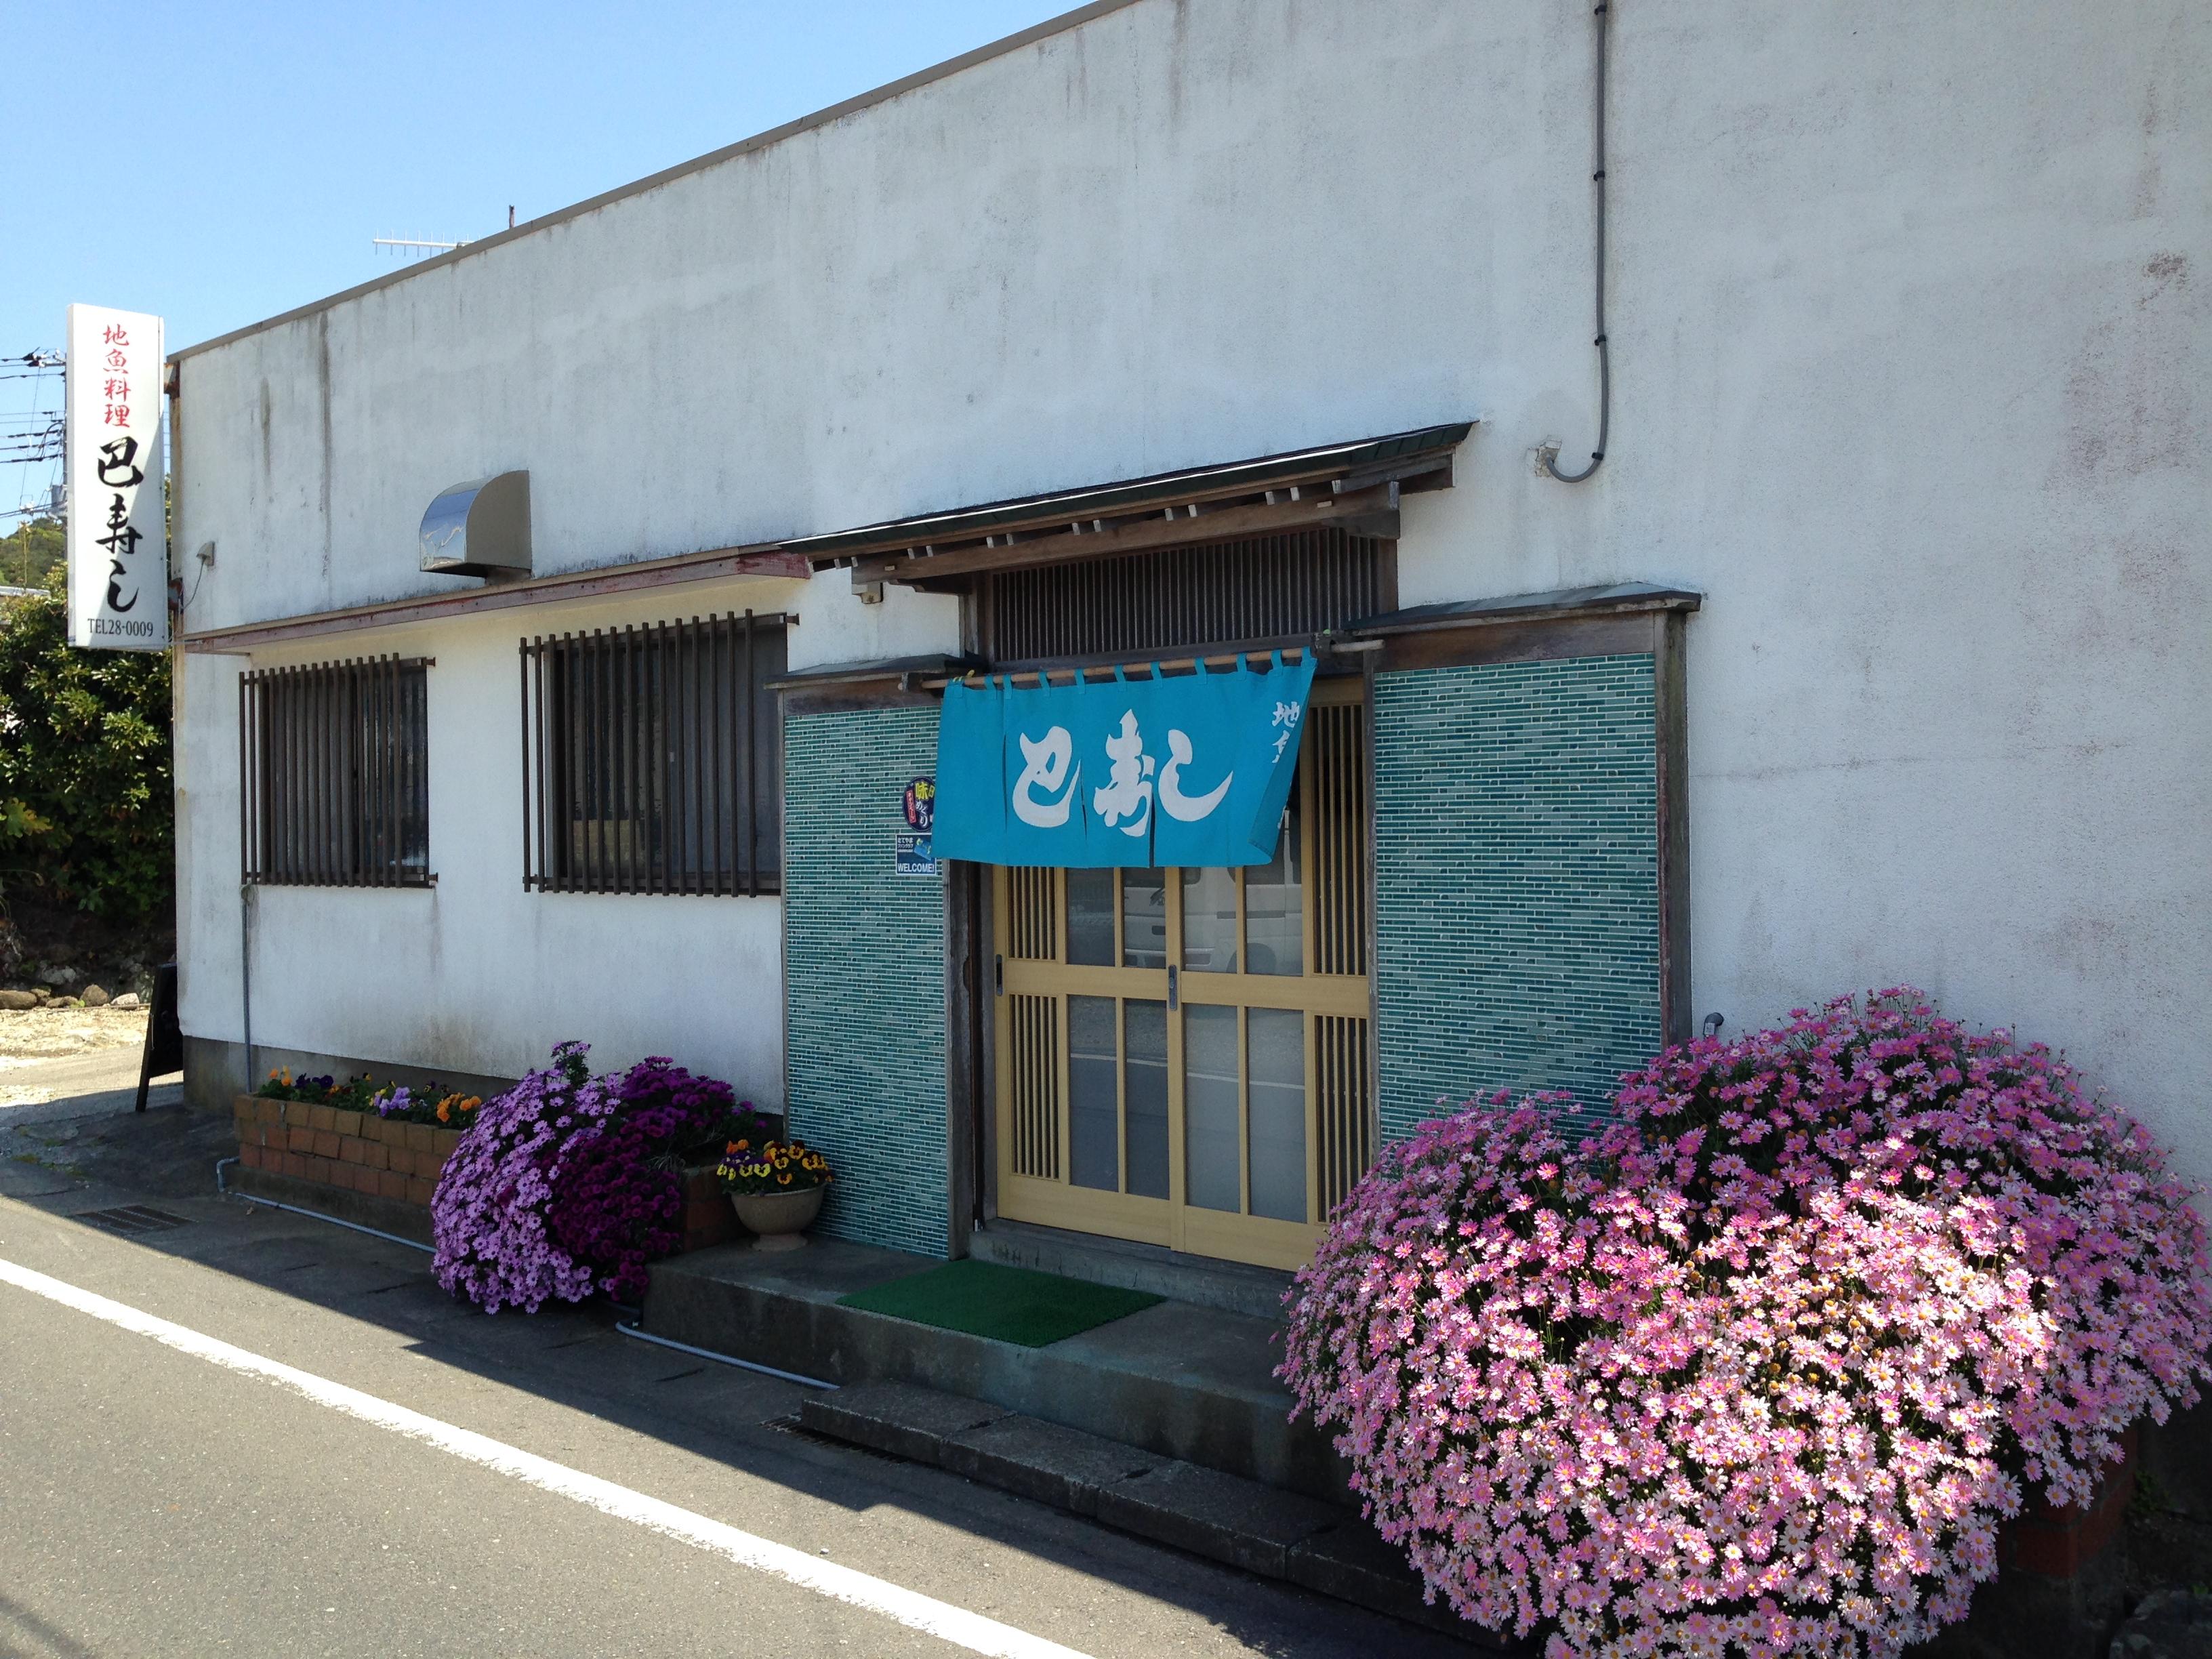 http://blog.corco.jp/corcovado/IMG_9101.JPG